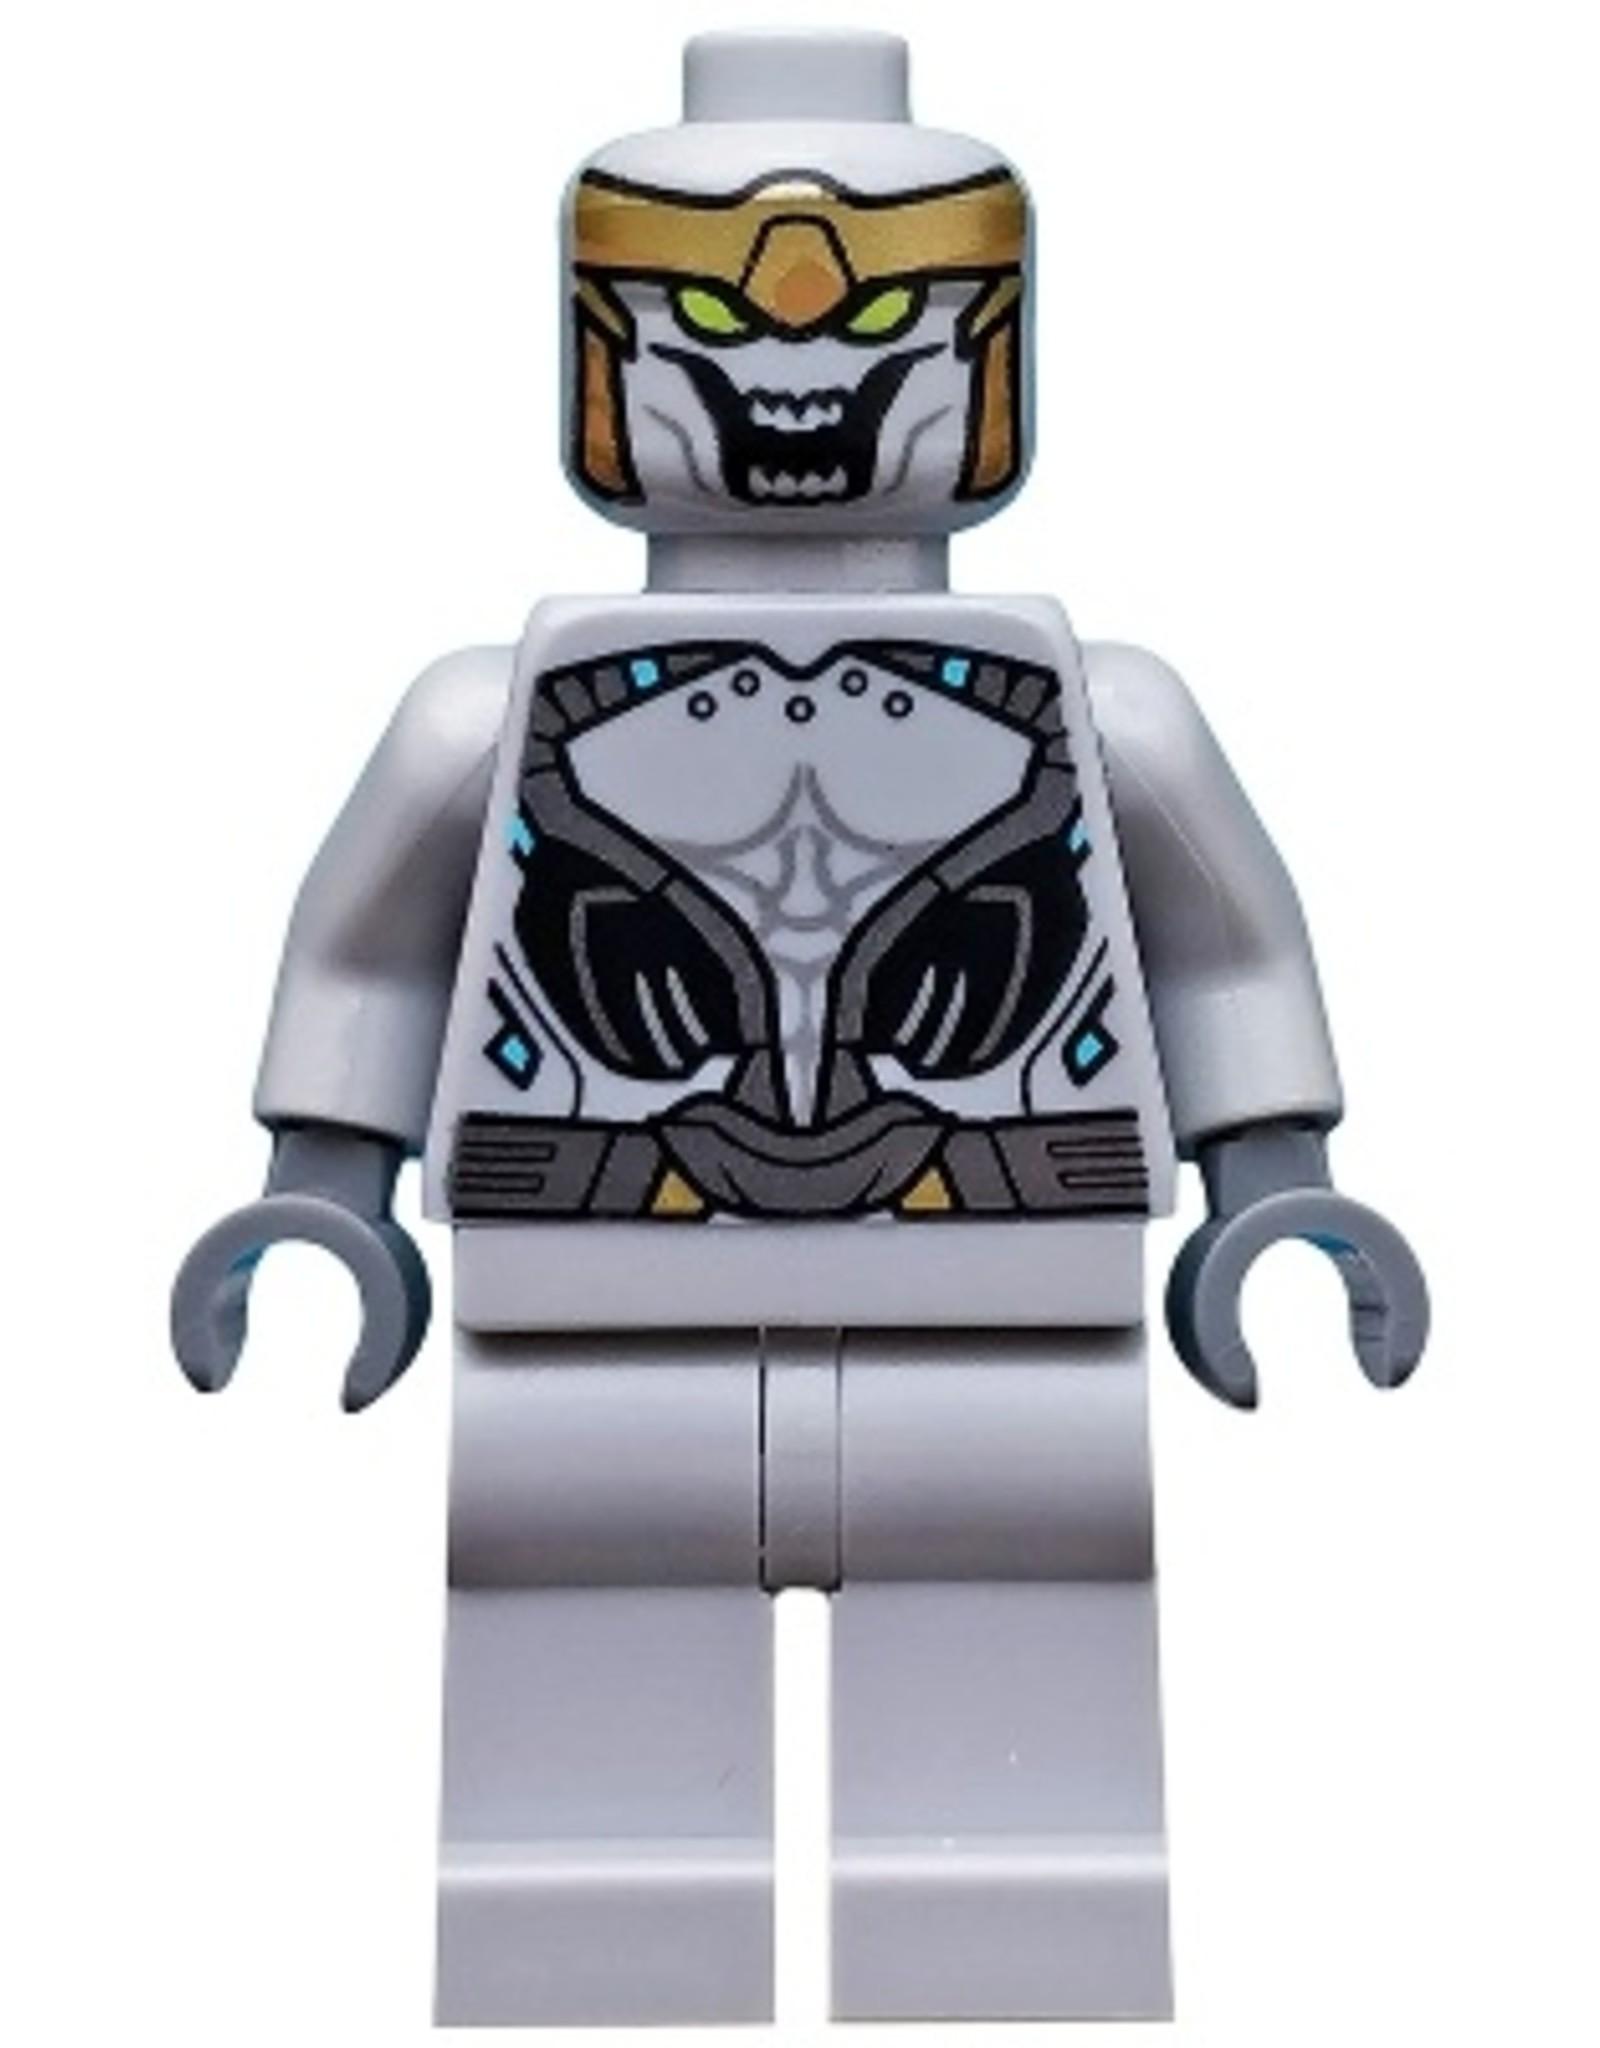 LEGO LEGO Super Heroes Chituari minifiguur SH568